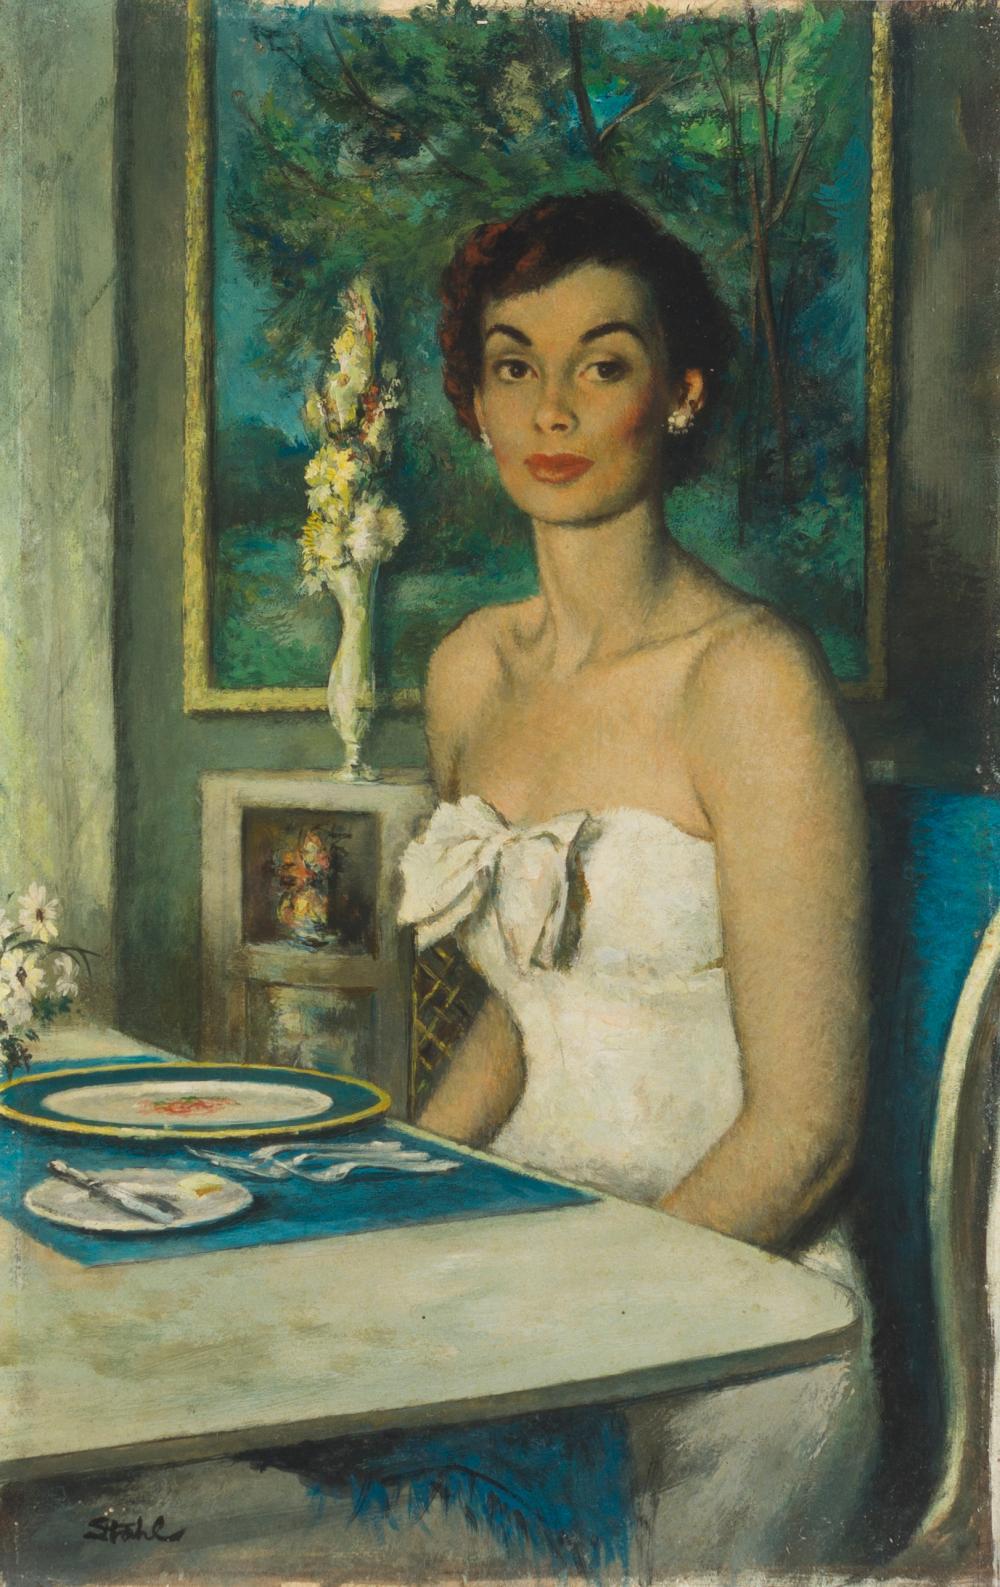 "Benjamin Stahl, (1910-1987 Sarasota, FL), Young woman seated, Oil on board, 14.5"" H x 9"" W"